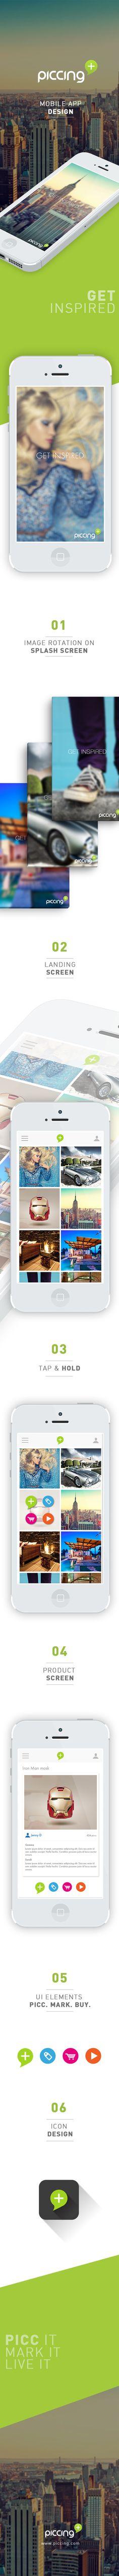 Piccing Mobile App by Geran de Klerk, via Behance